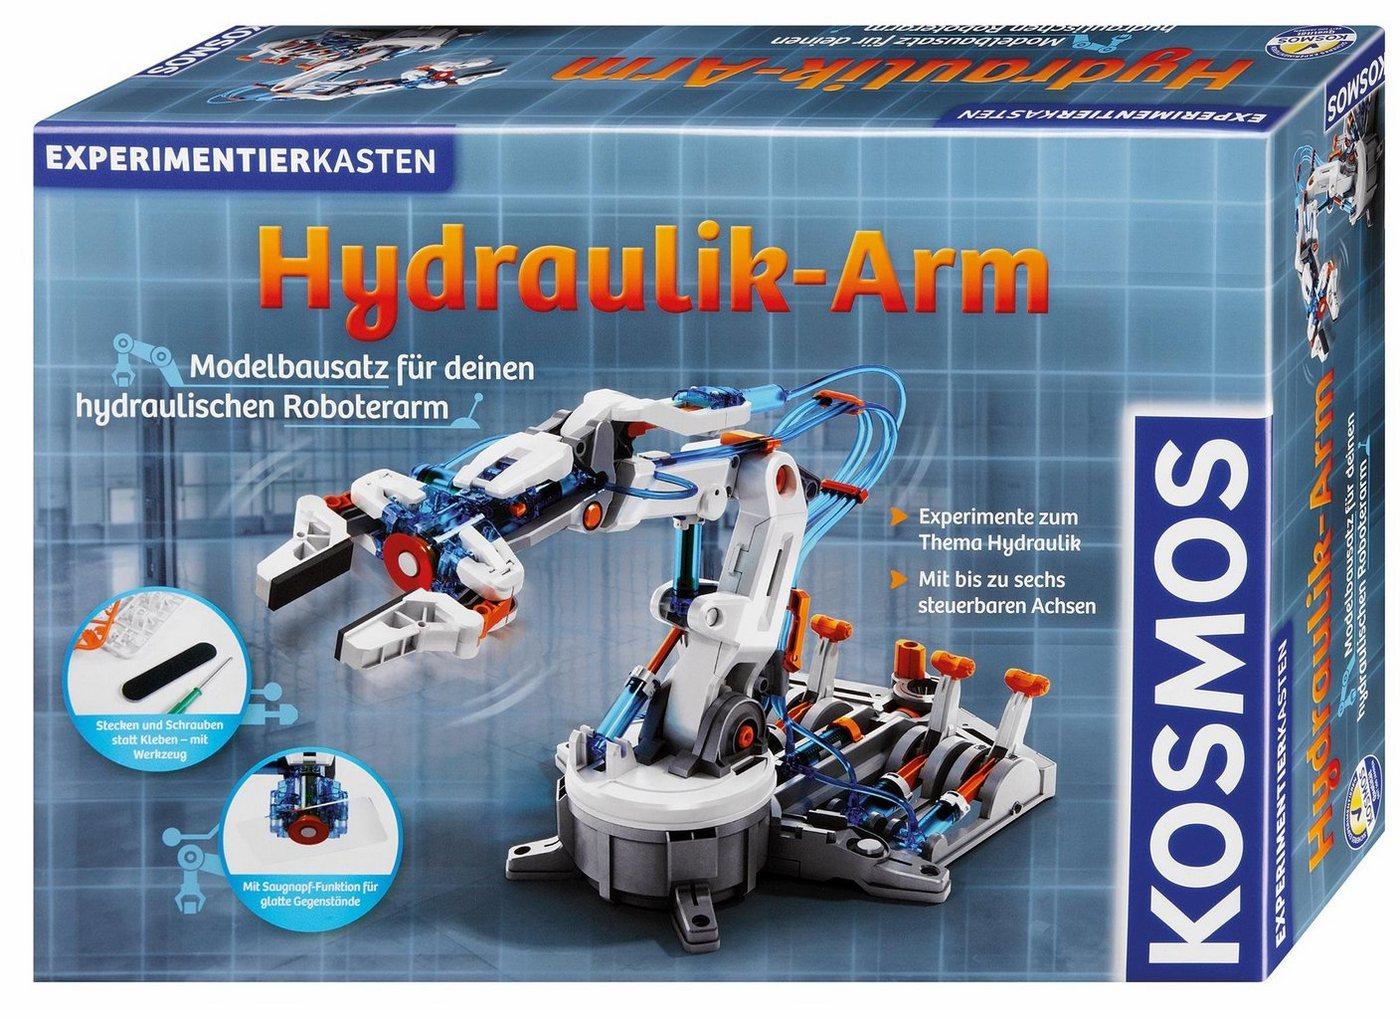 Image of Experimentierkasten Hydraulik-Arm